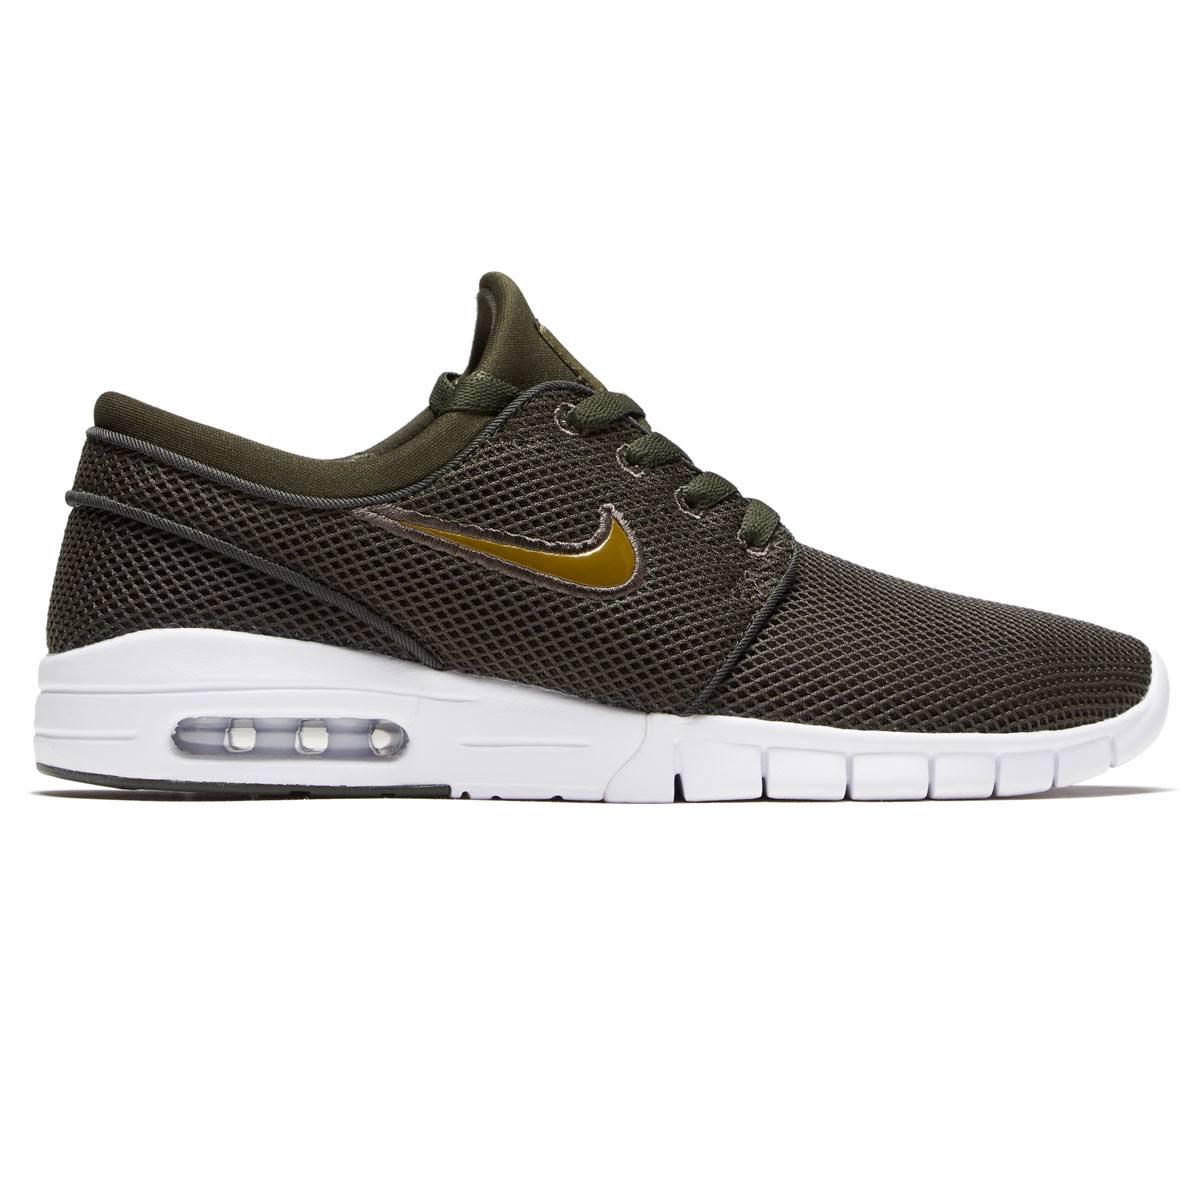 11 5 631303304 Max Olive Blanco Tamaño Nike Sb Sequoia Hombre Janoski Stefan Flak Para Zapatos FwzvAw